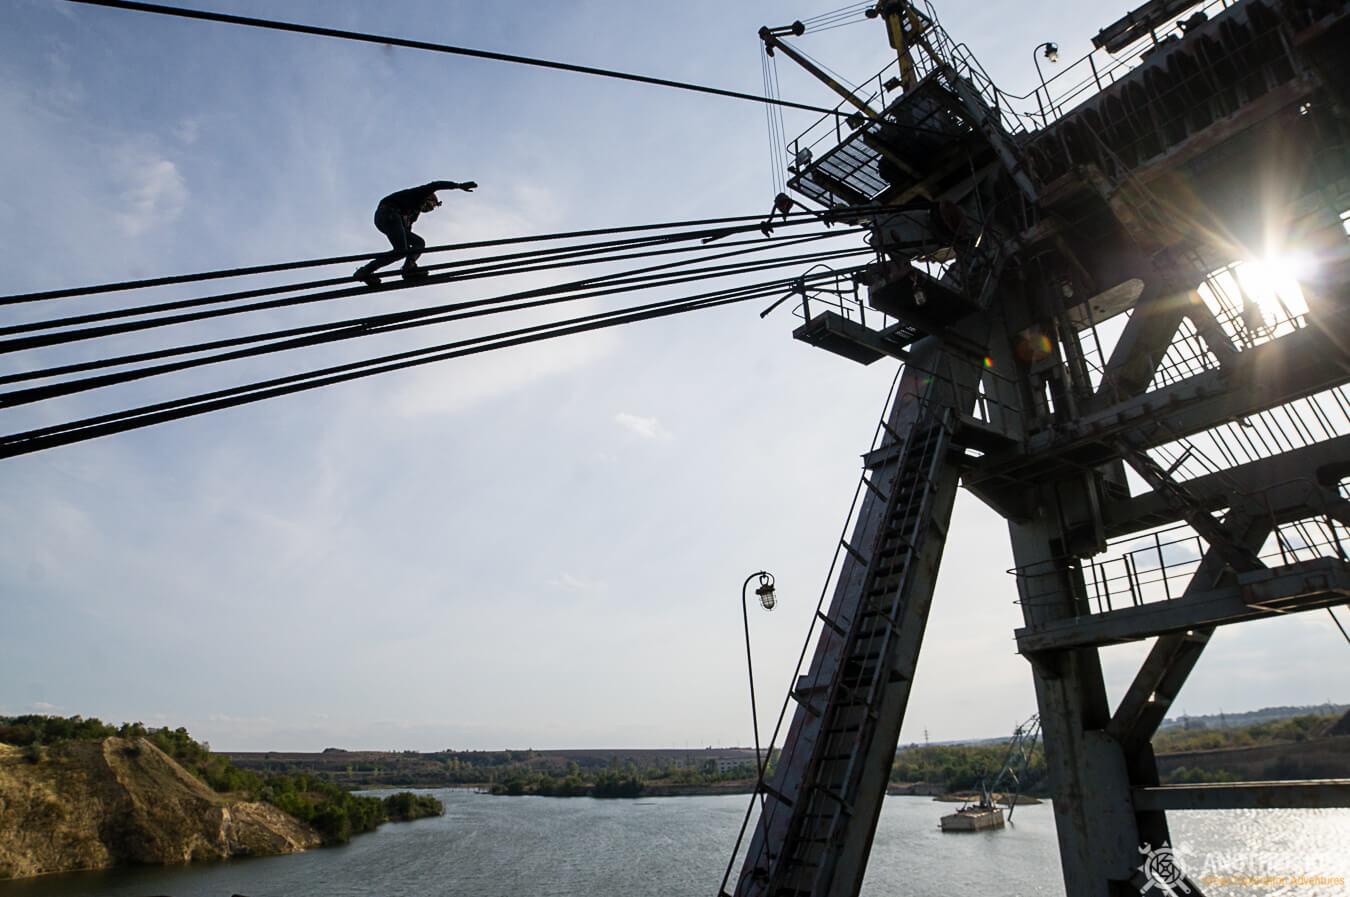 climbing on abandoned mining machine